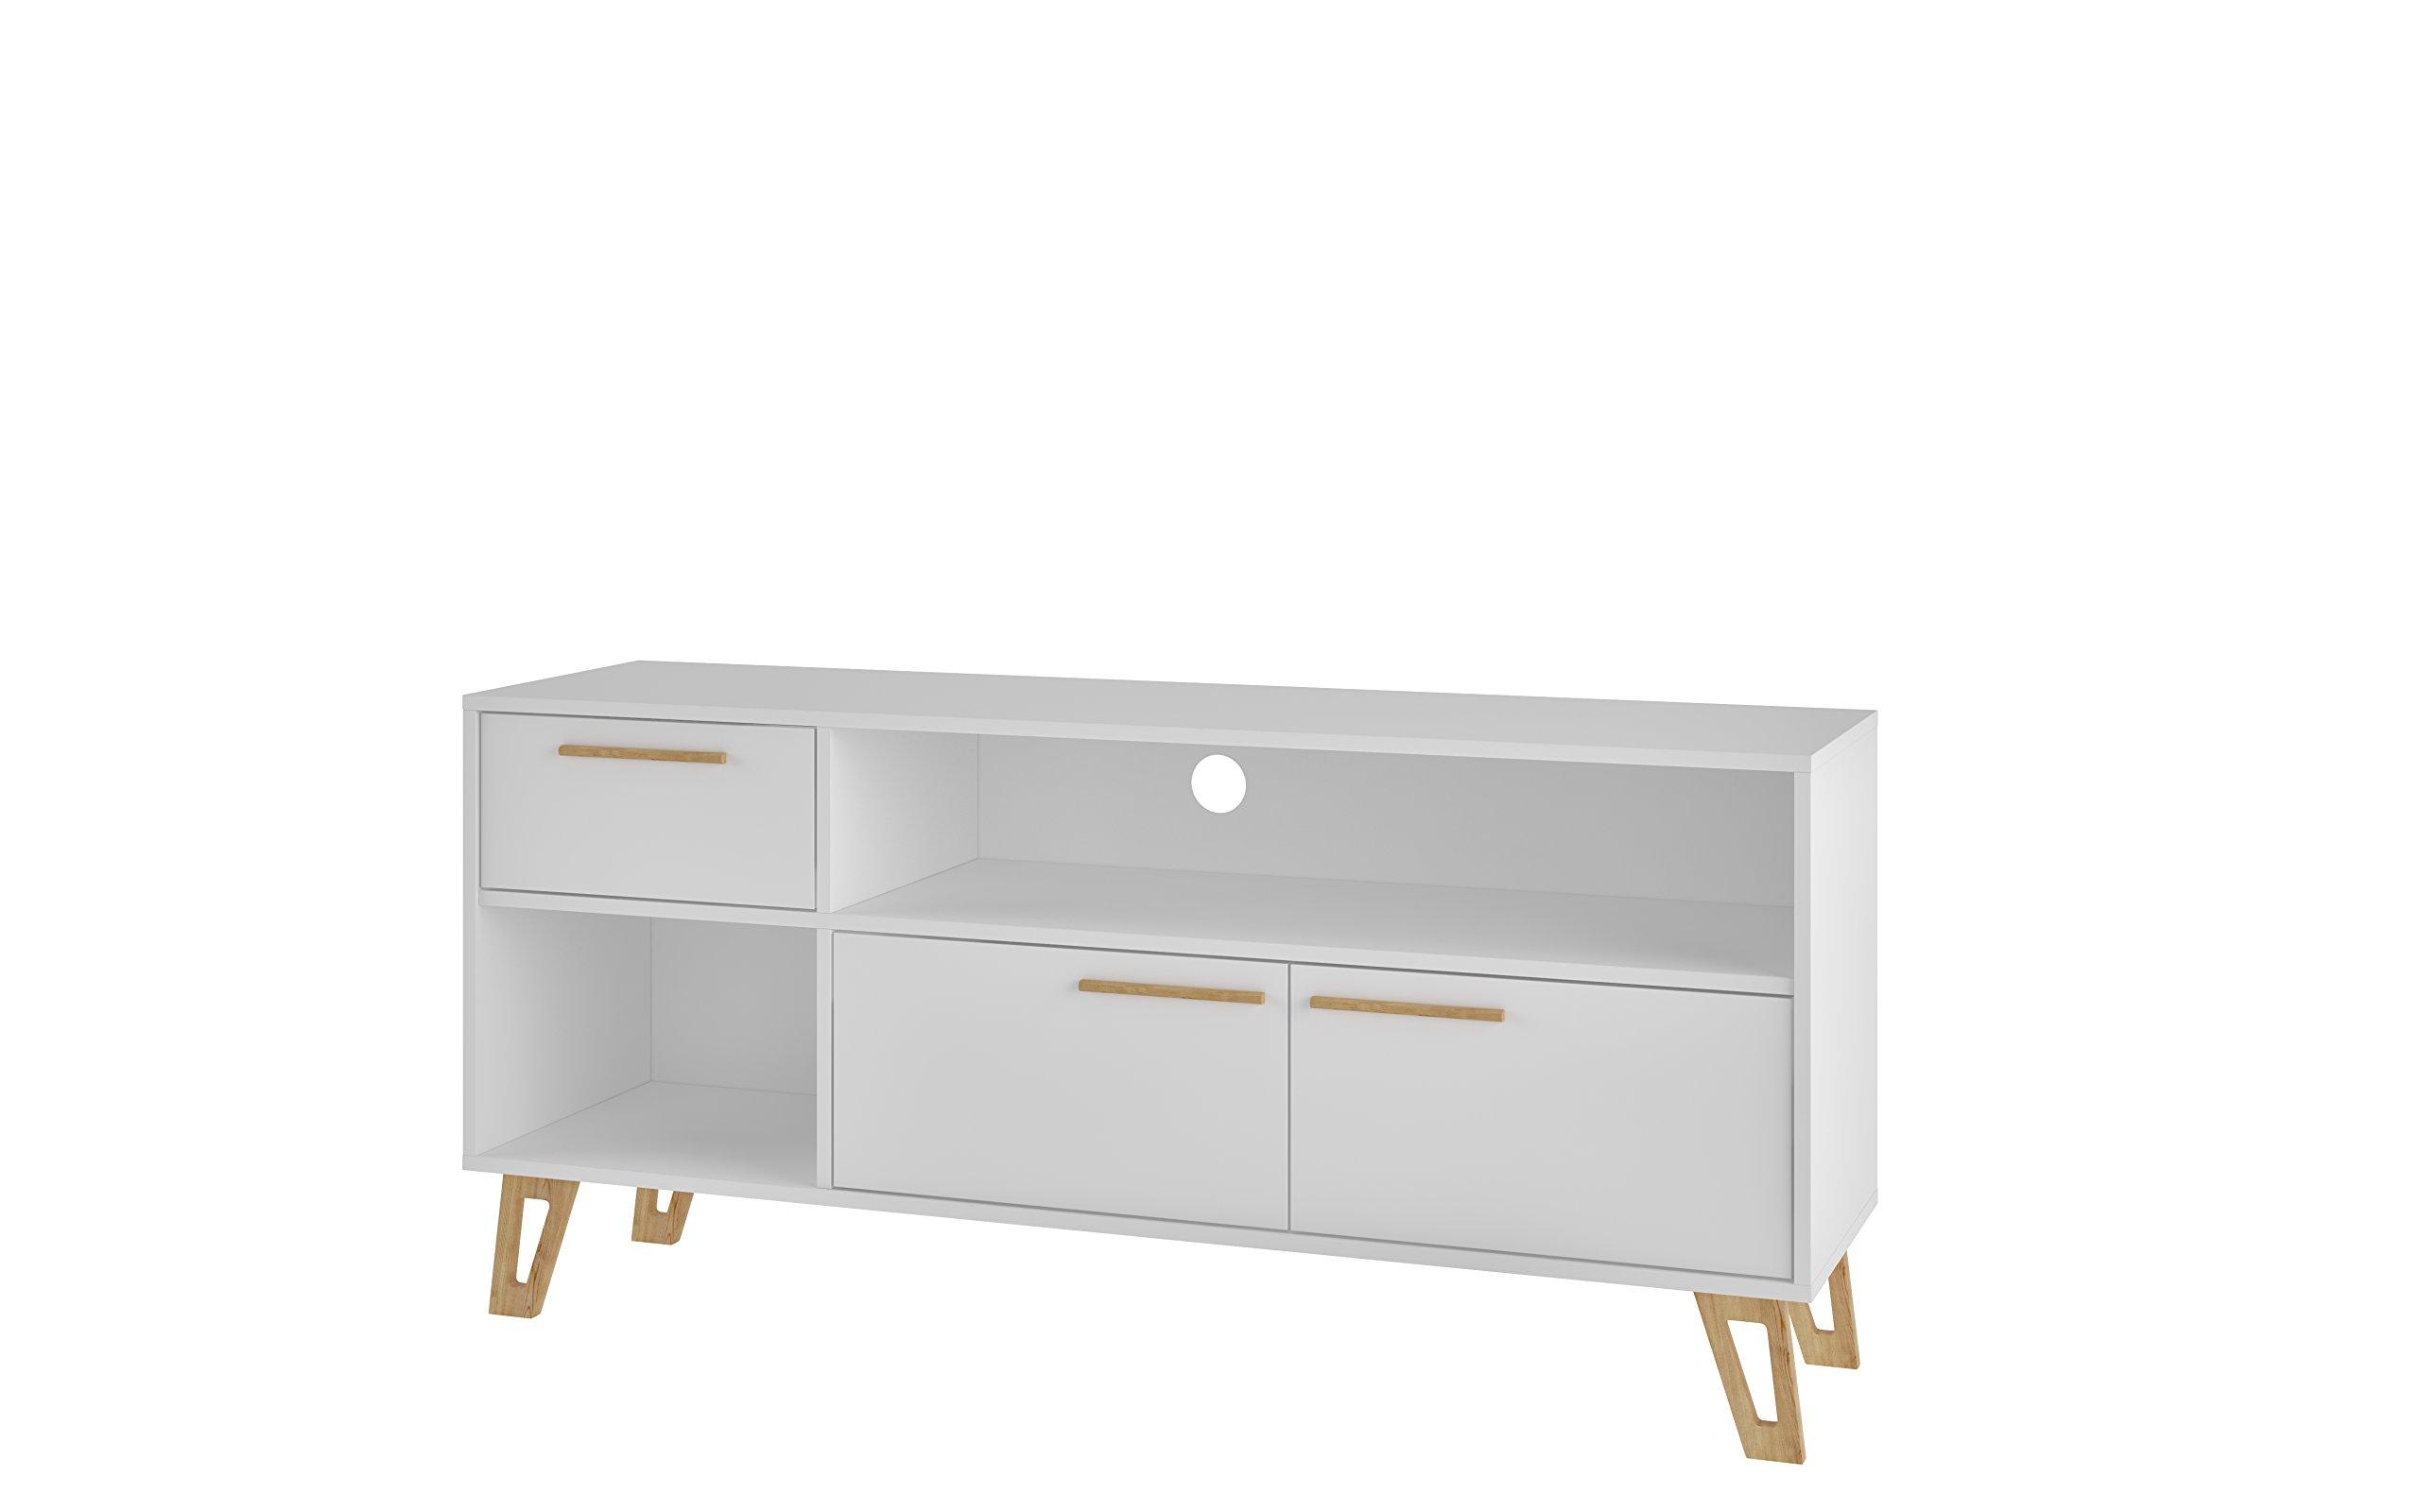 Manhattan Comfort Doris Mid-Century Modern Living Room TV Stand, White by Manhattan Comfort